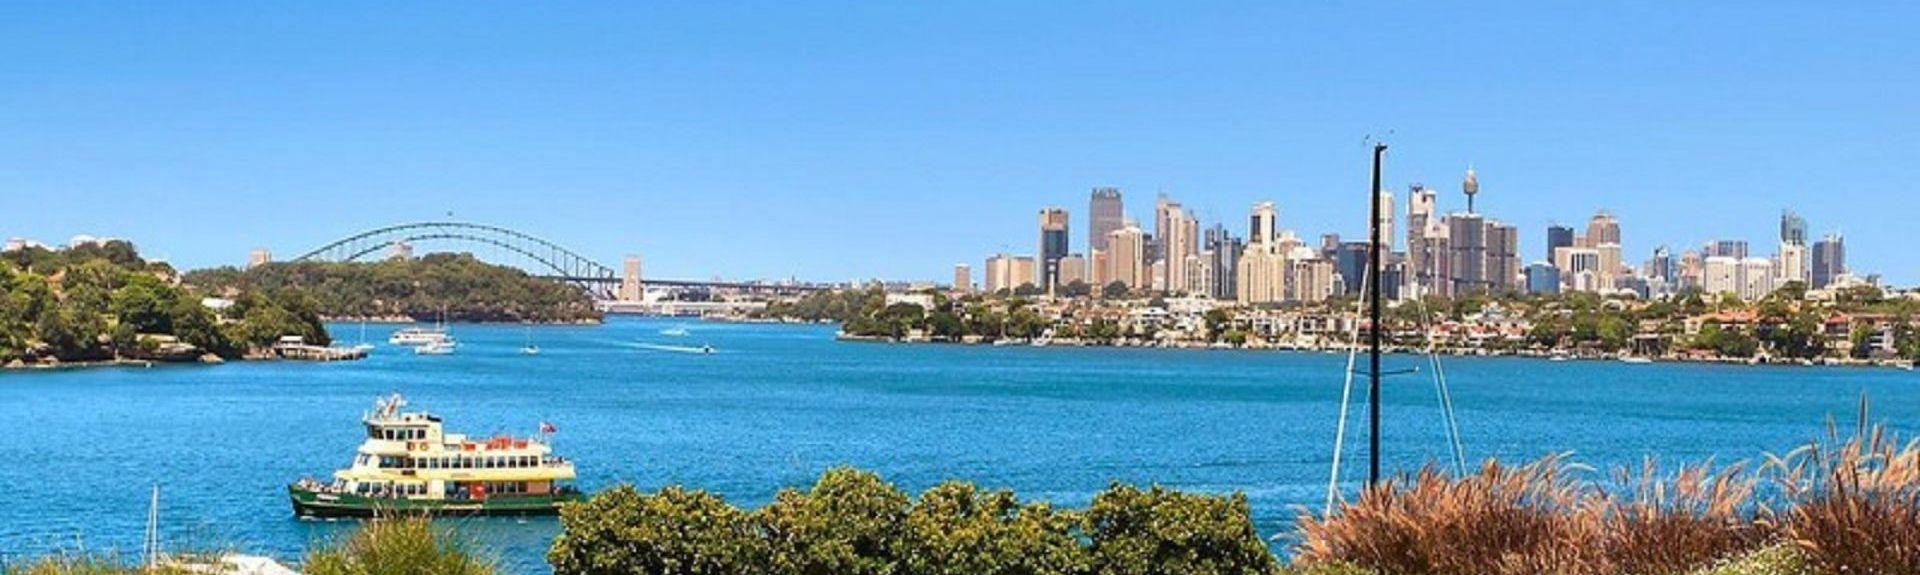 Punchbowl, Sydney, New South Wales, Australia